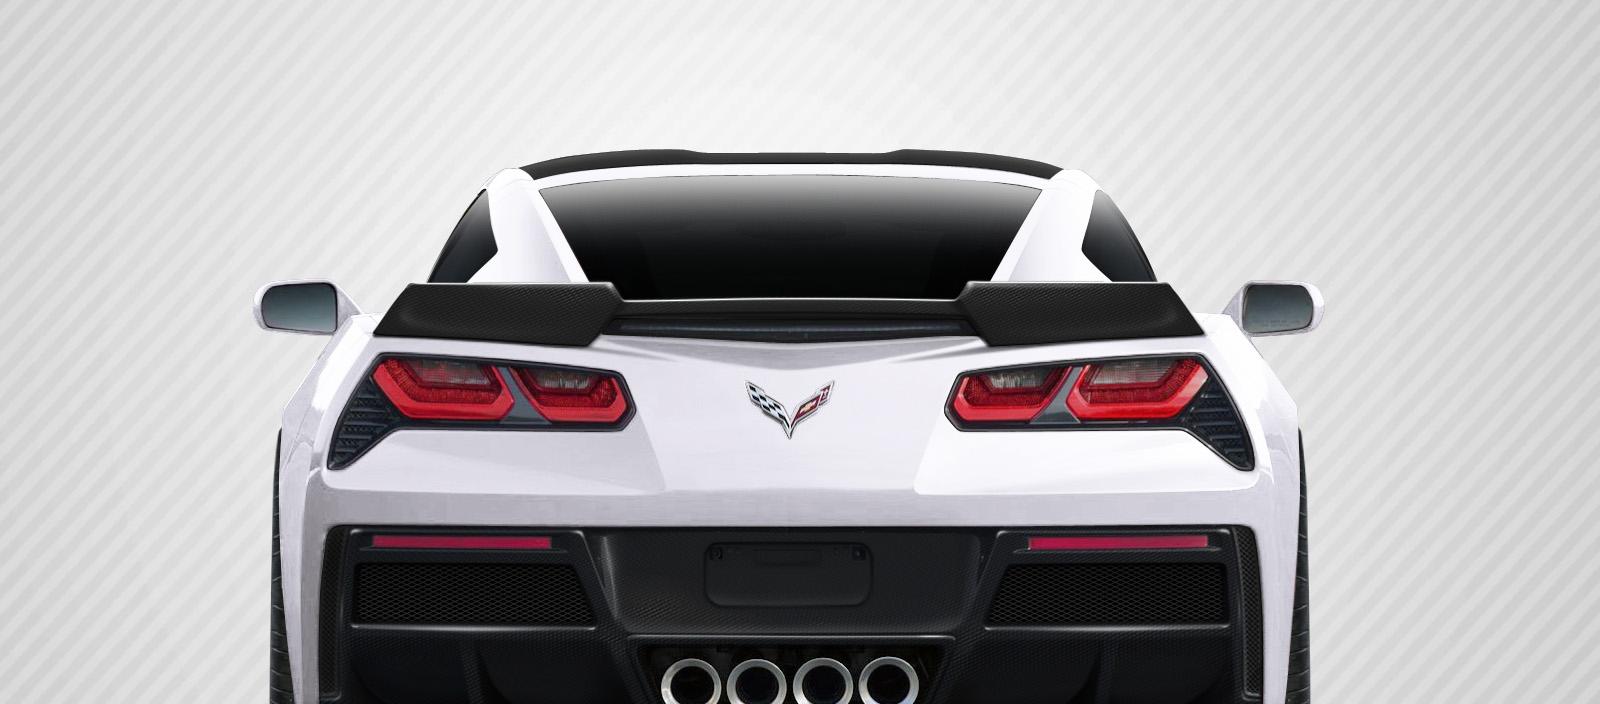 Wing Spoiler Bodykit for 2016 Chevrolet Corvette ALL - Chevrolet Corvette C7 Carbon Creations Gran Veloce Wing- 1 Piece